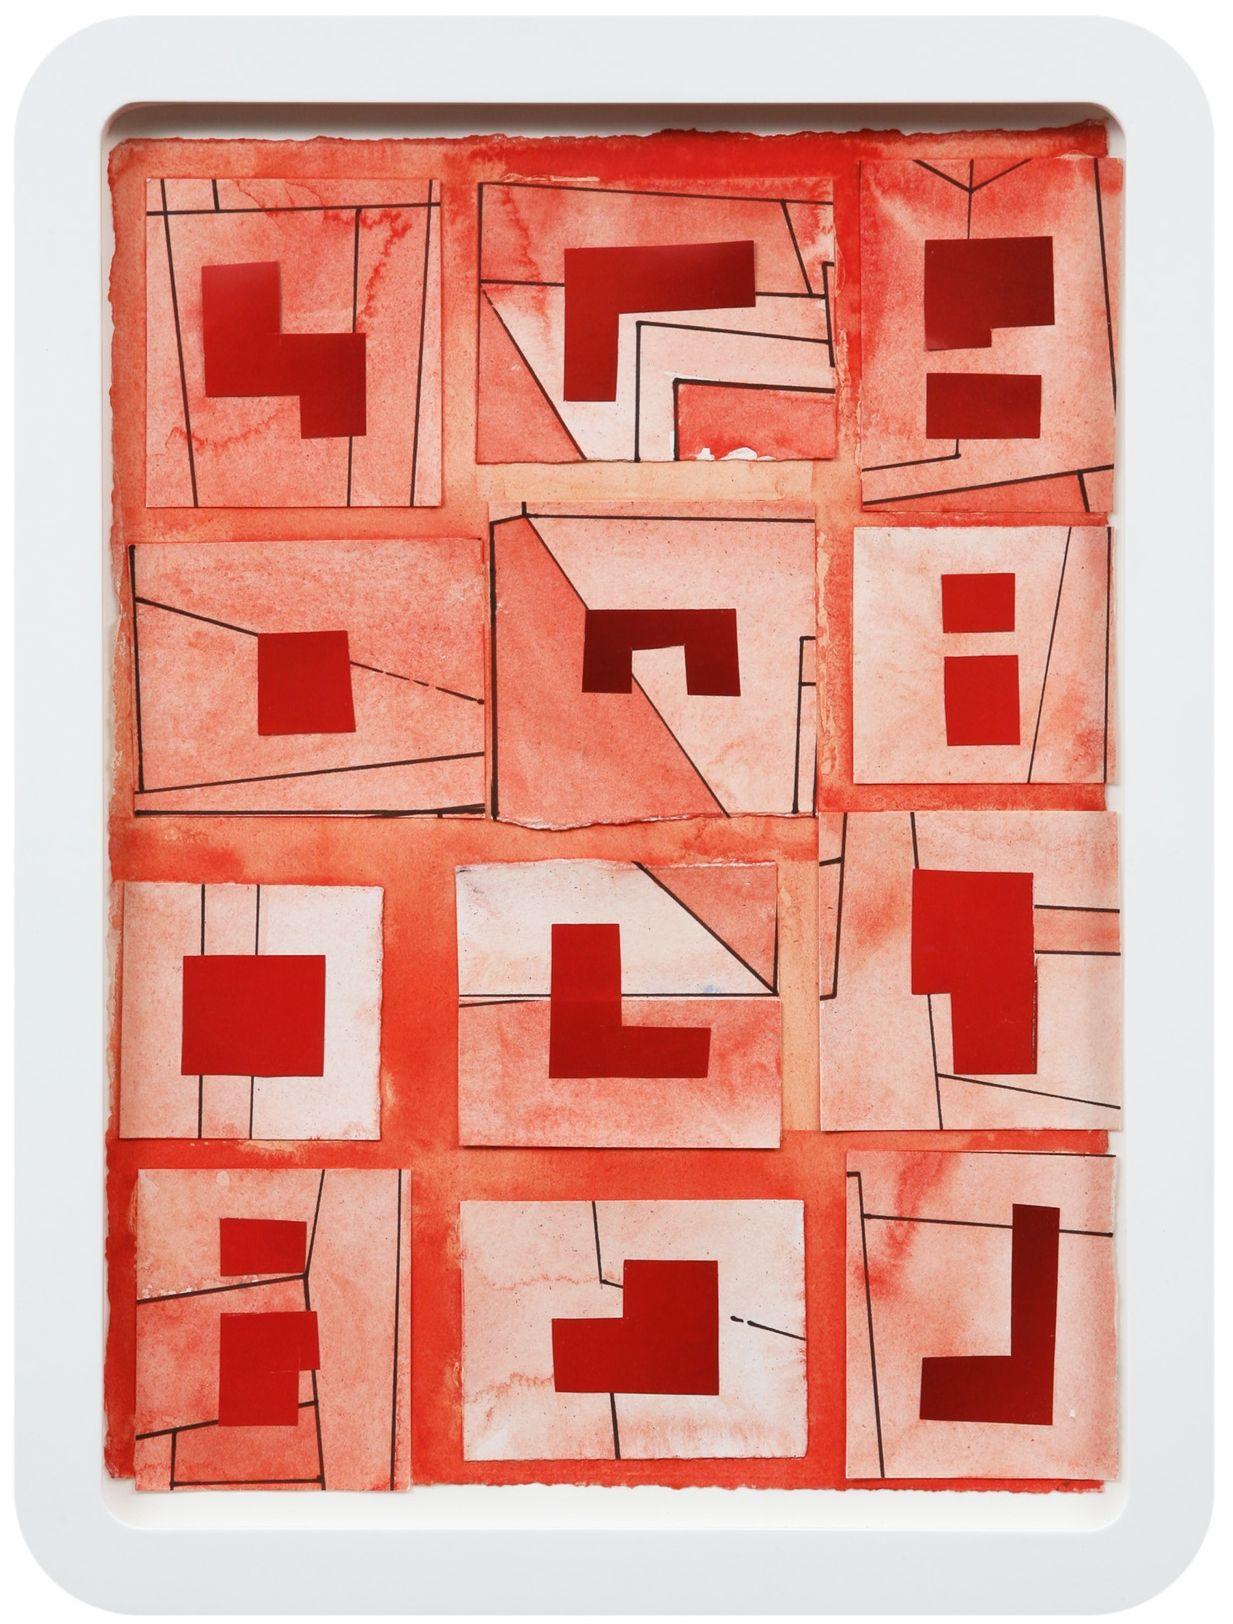 Doug Aitken, ultraworld S, 2007